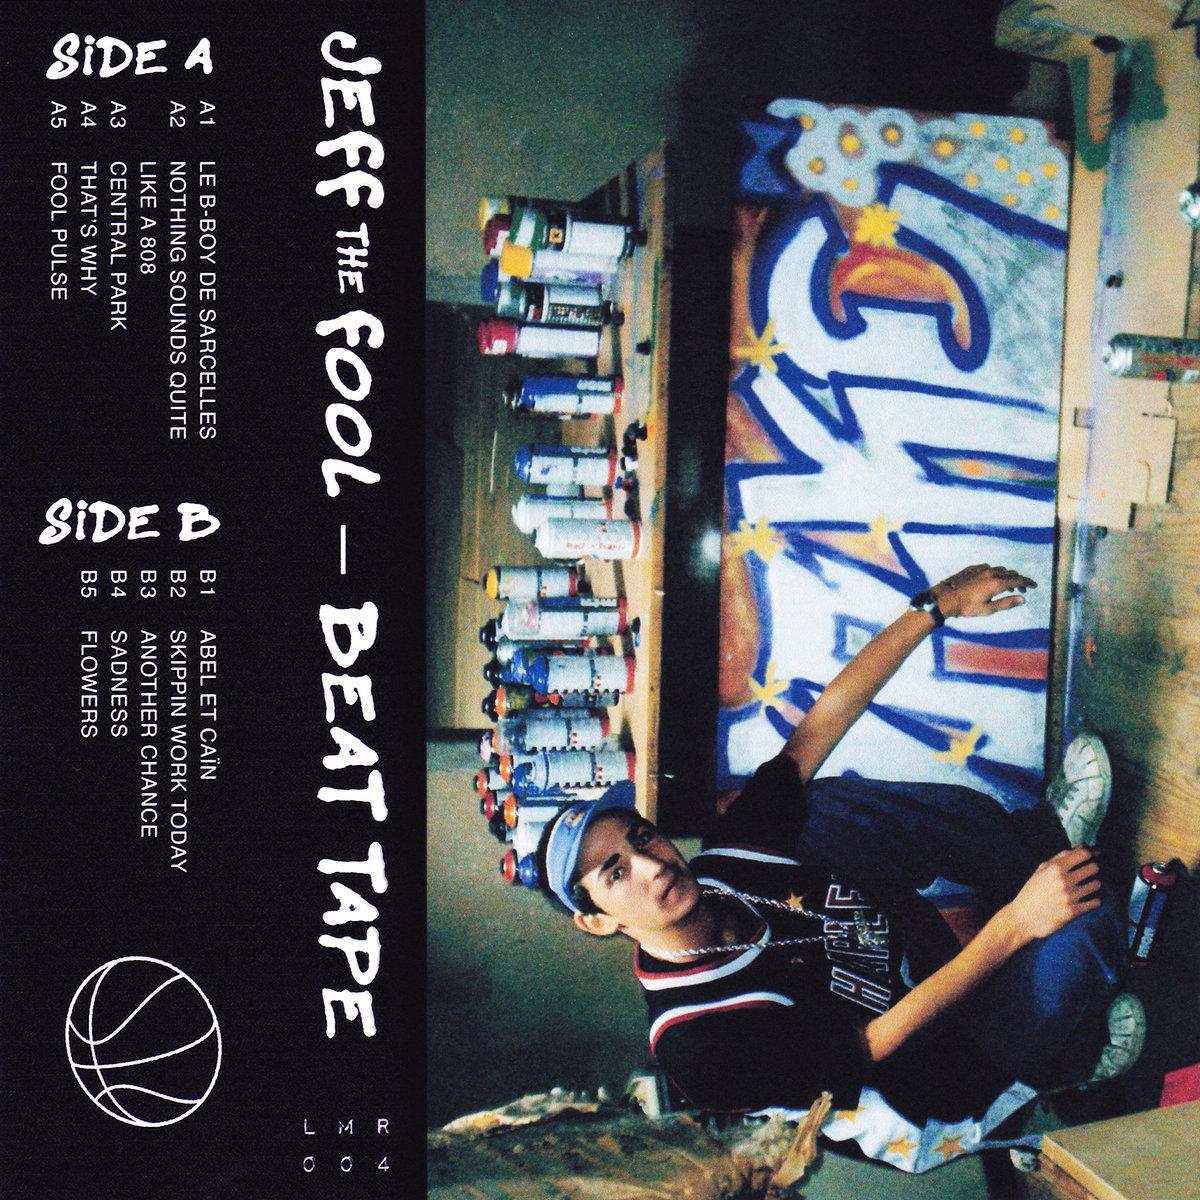 LMR 004 - Beat Tape